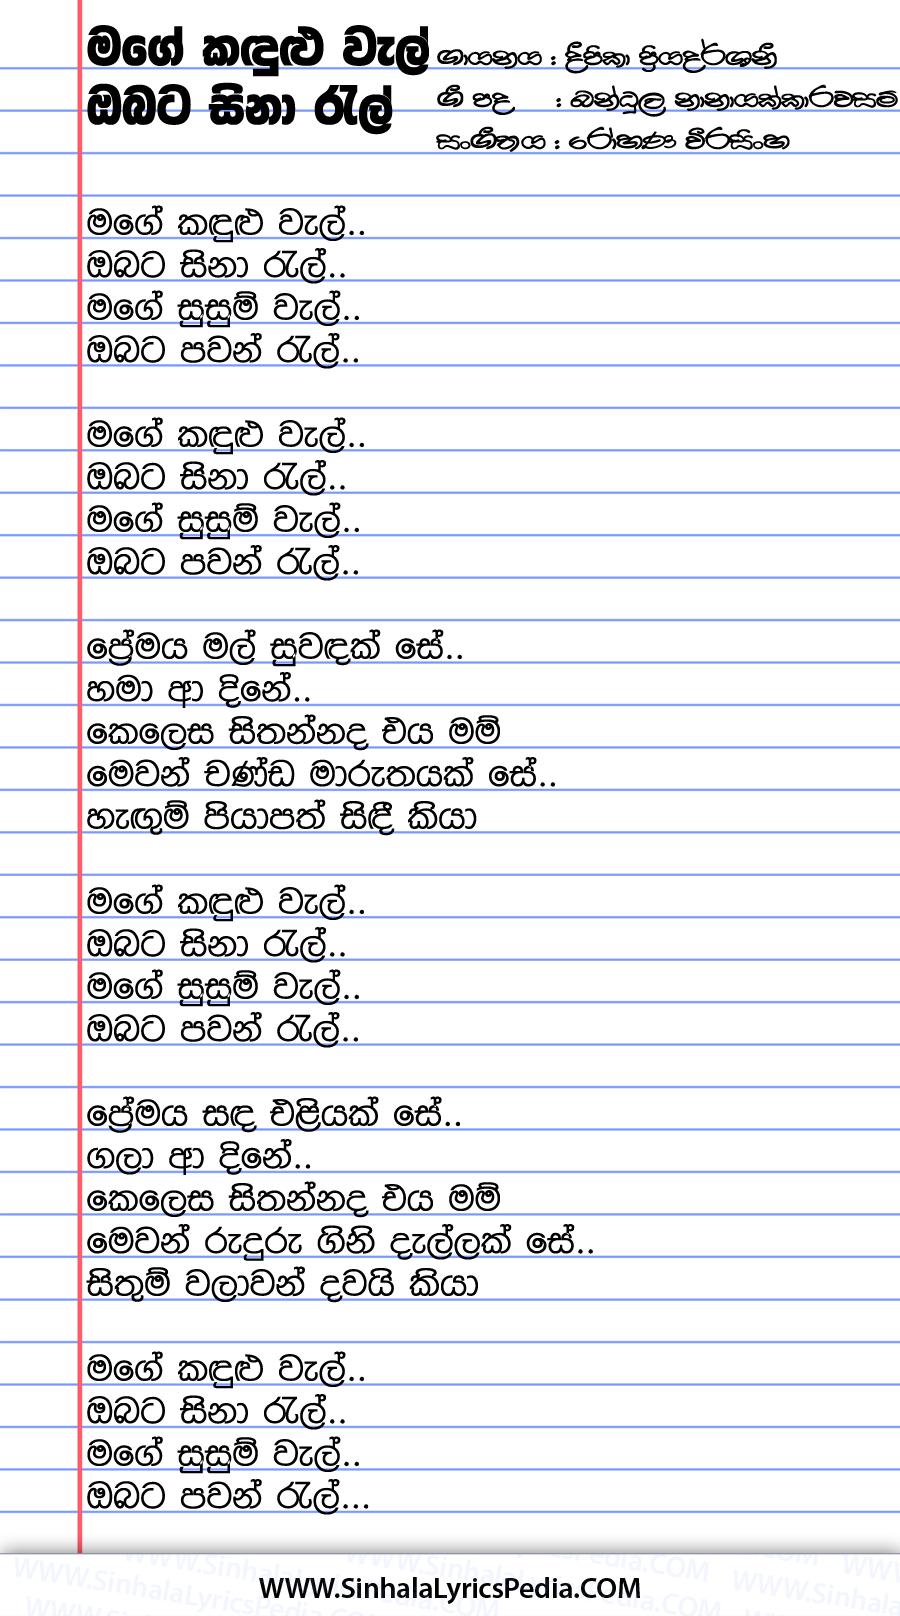 Mage Kandulu Wel Song Lyrics